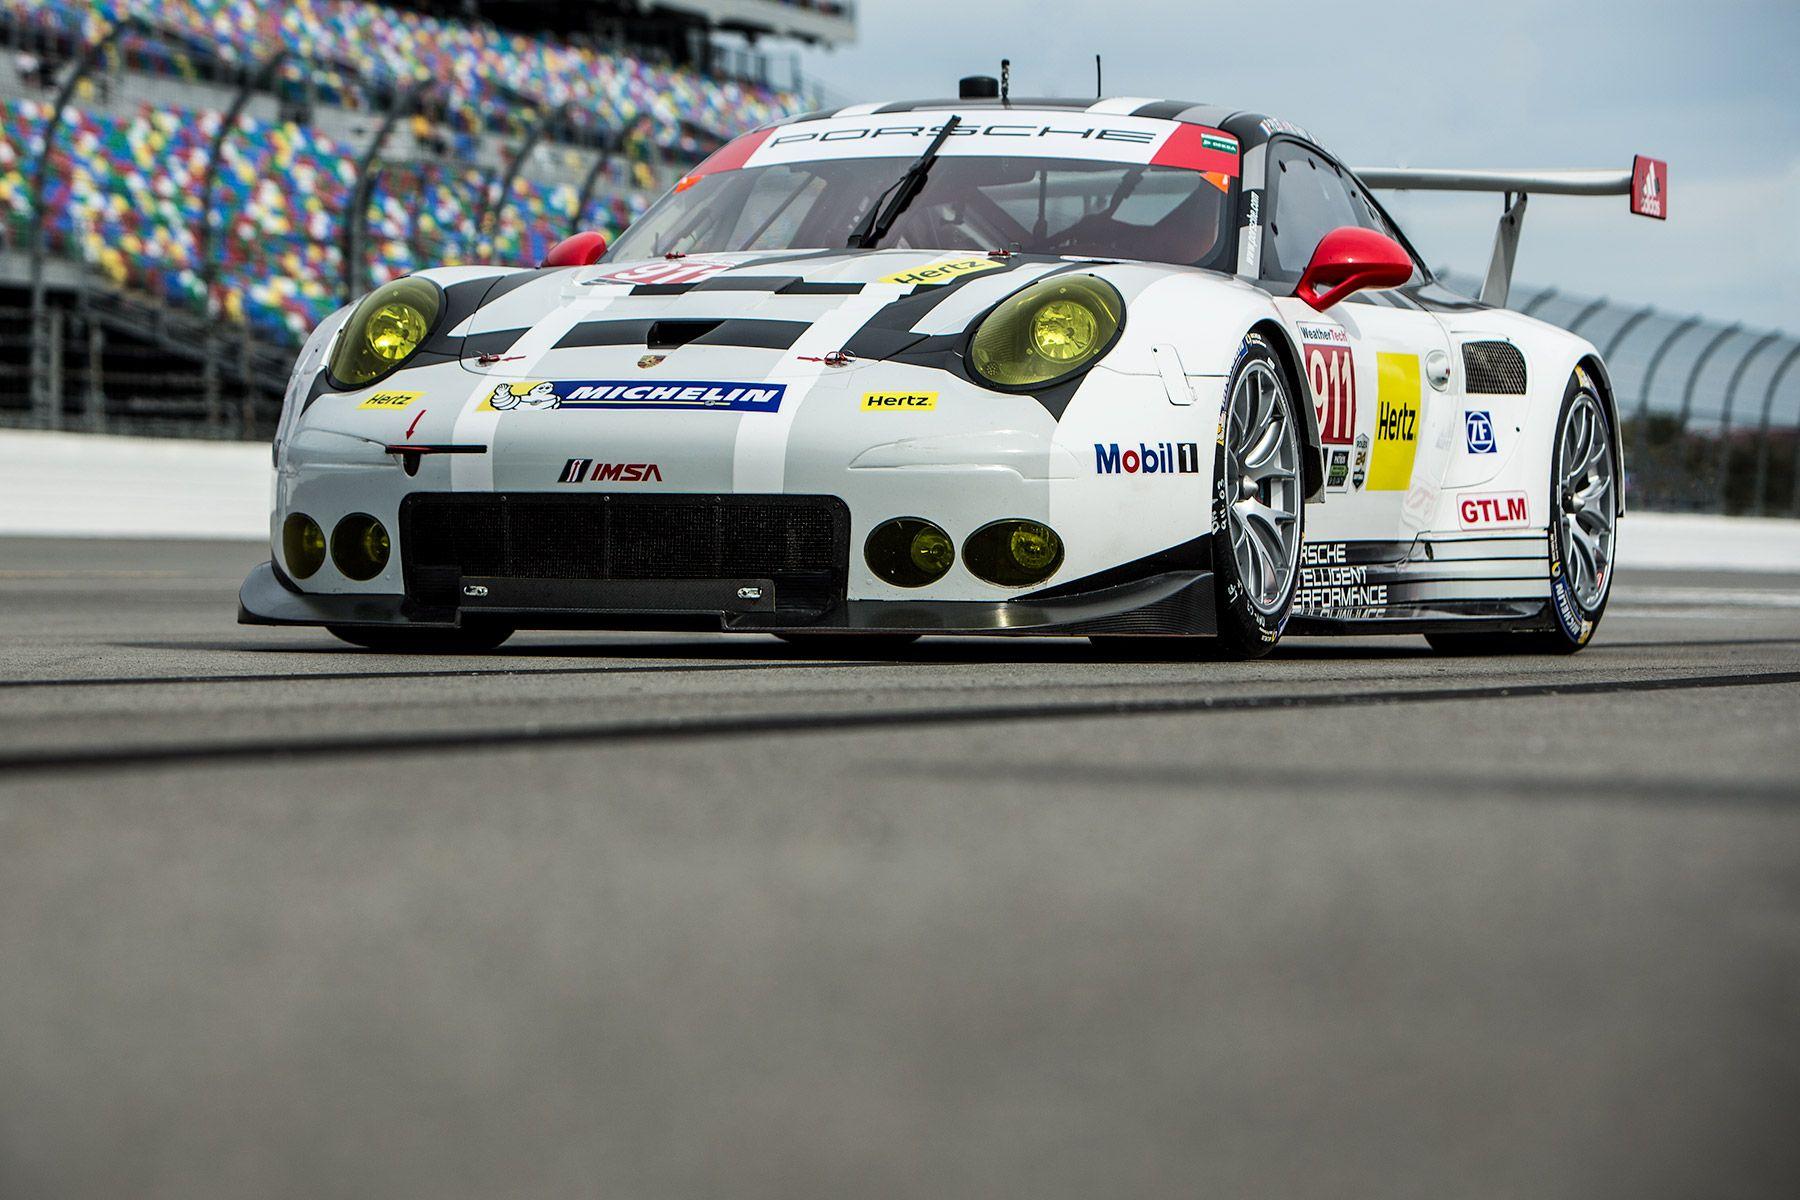 Porsche_911RSR_Daytona_Stands_CROP.jpg